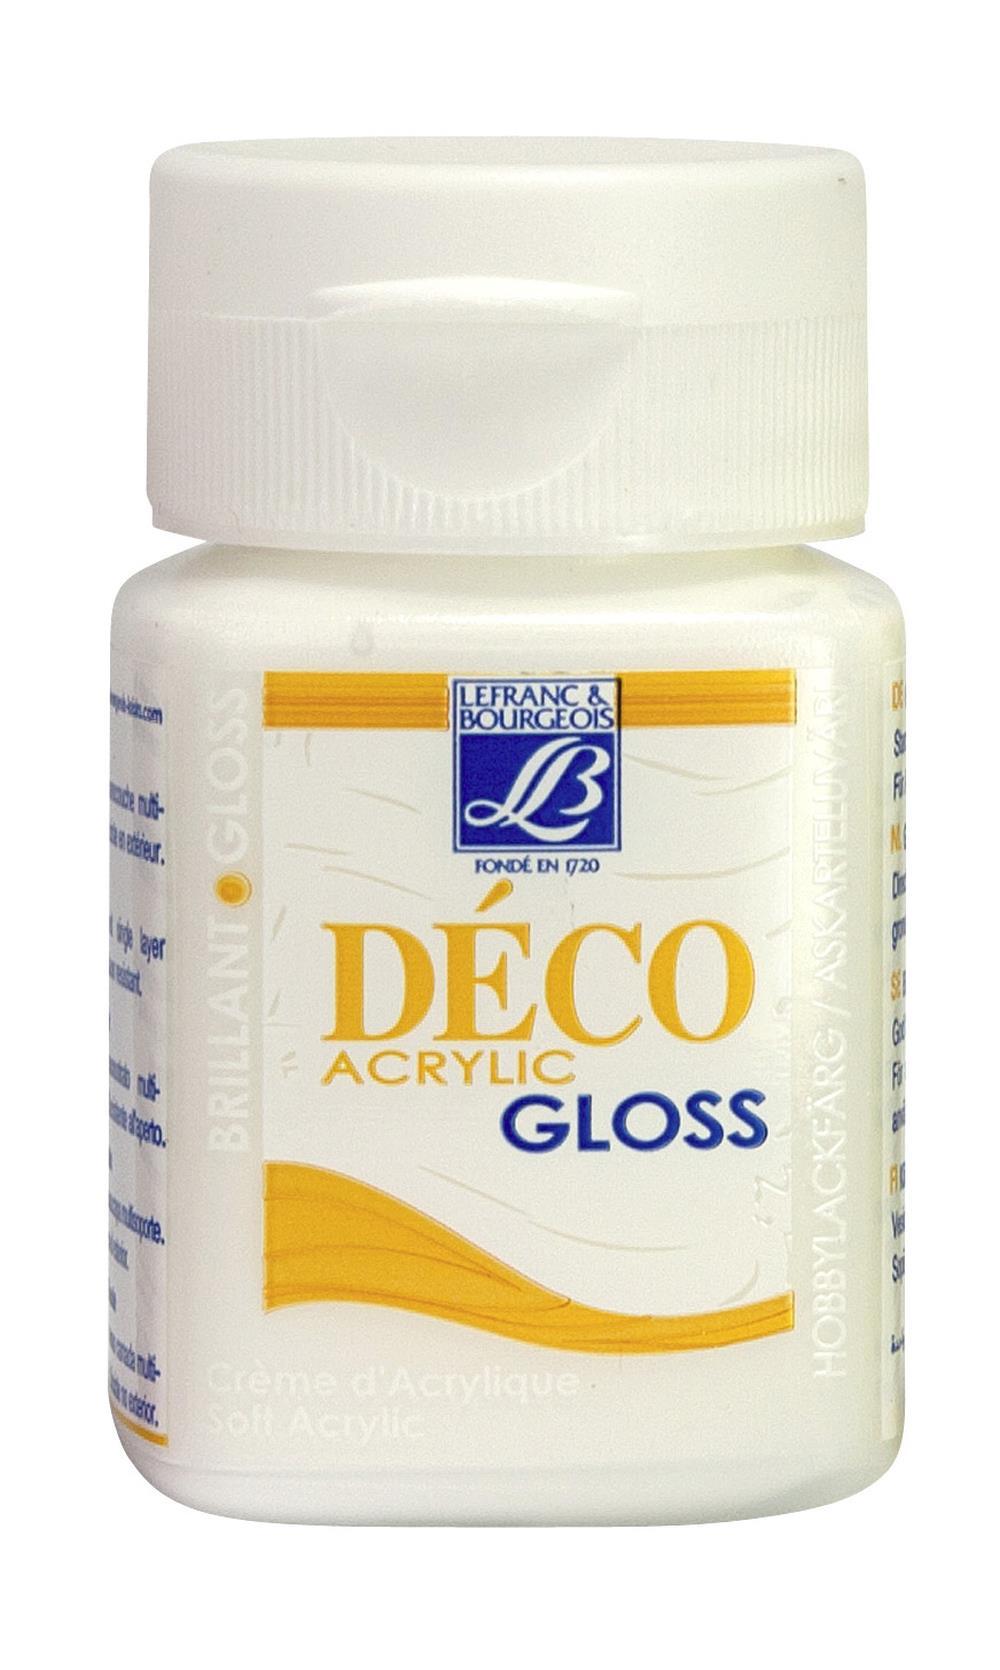 Hobbyfärg L&B Deco Gloss Akryl 50ml  White 001 (4F) Utgår